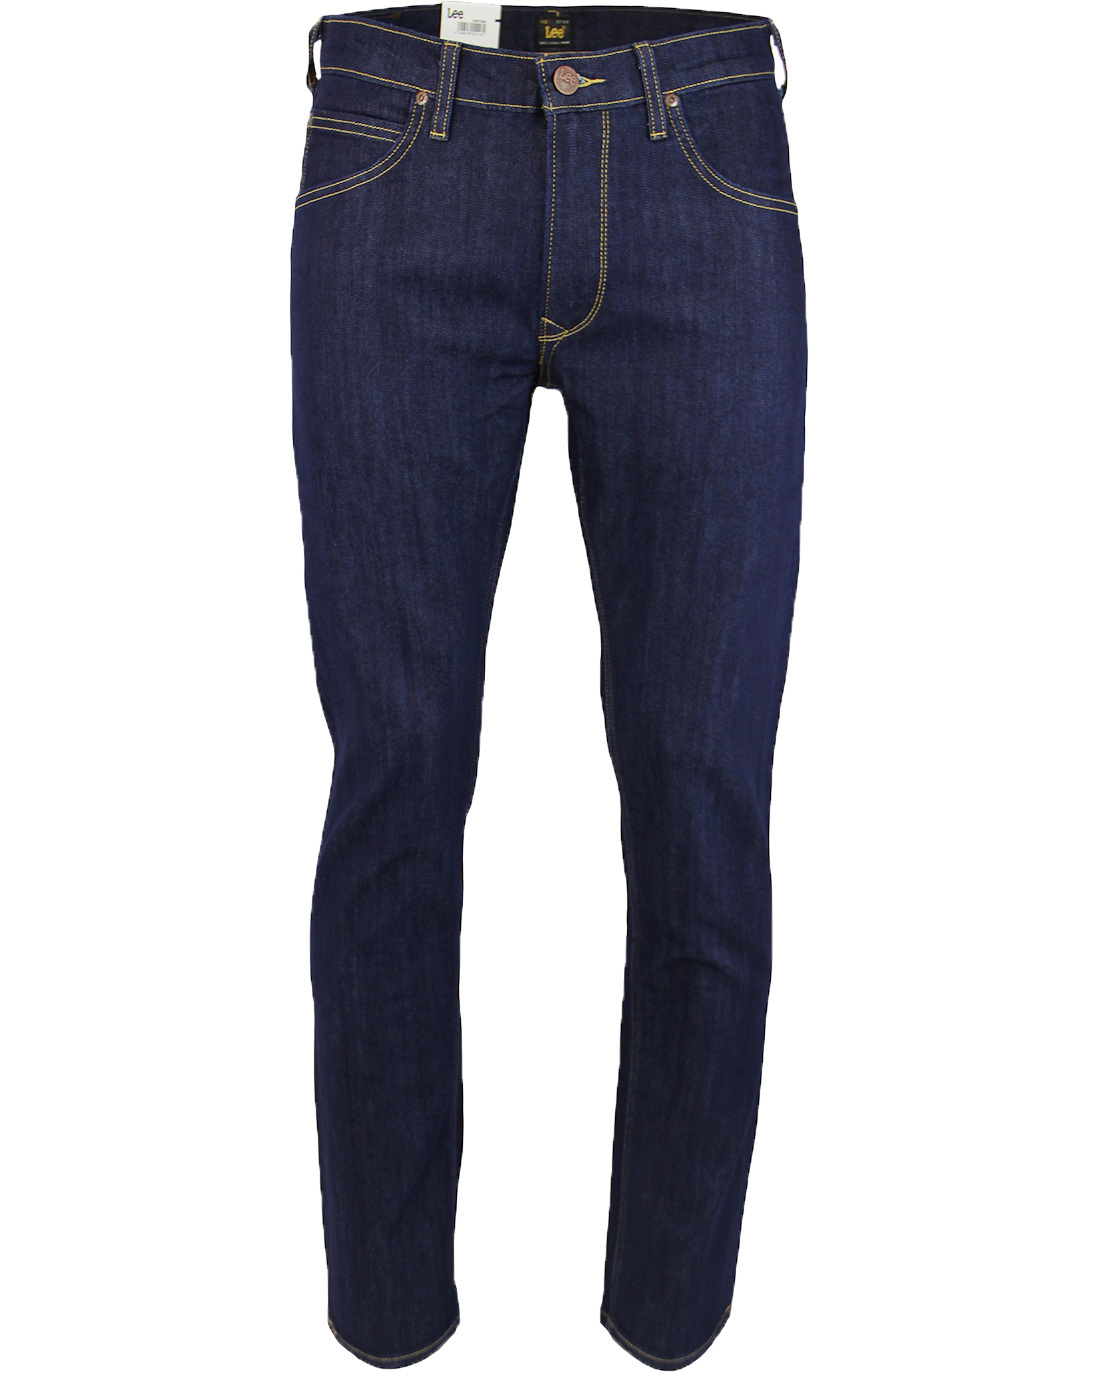 Daren LEE Retro Zip Fly Slim Leg Royal Rinse Jeans